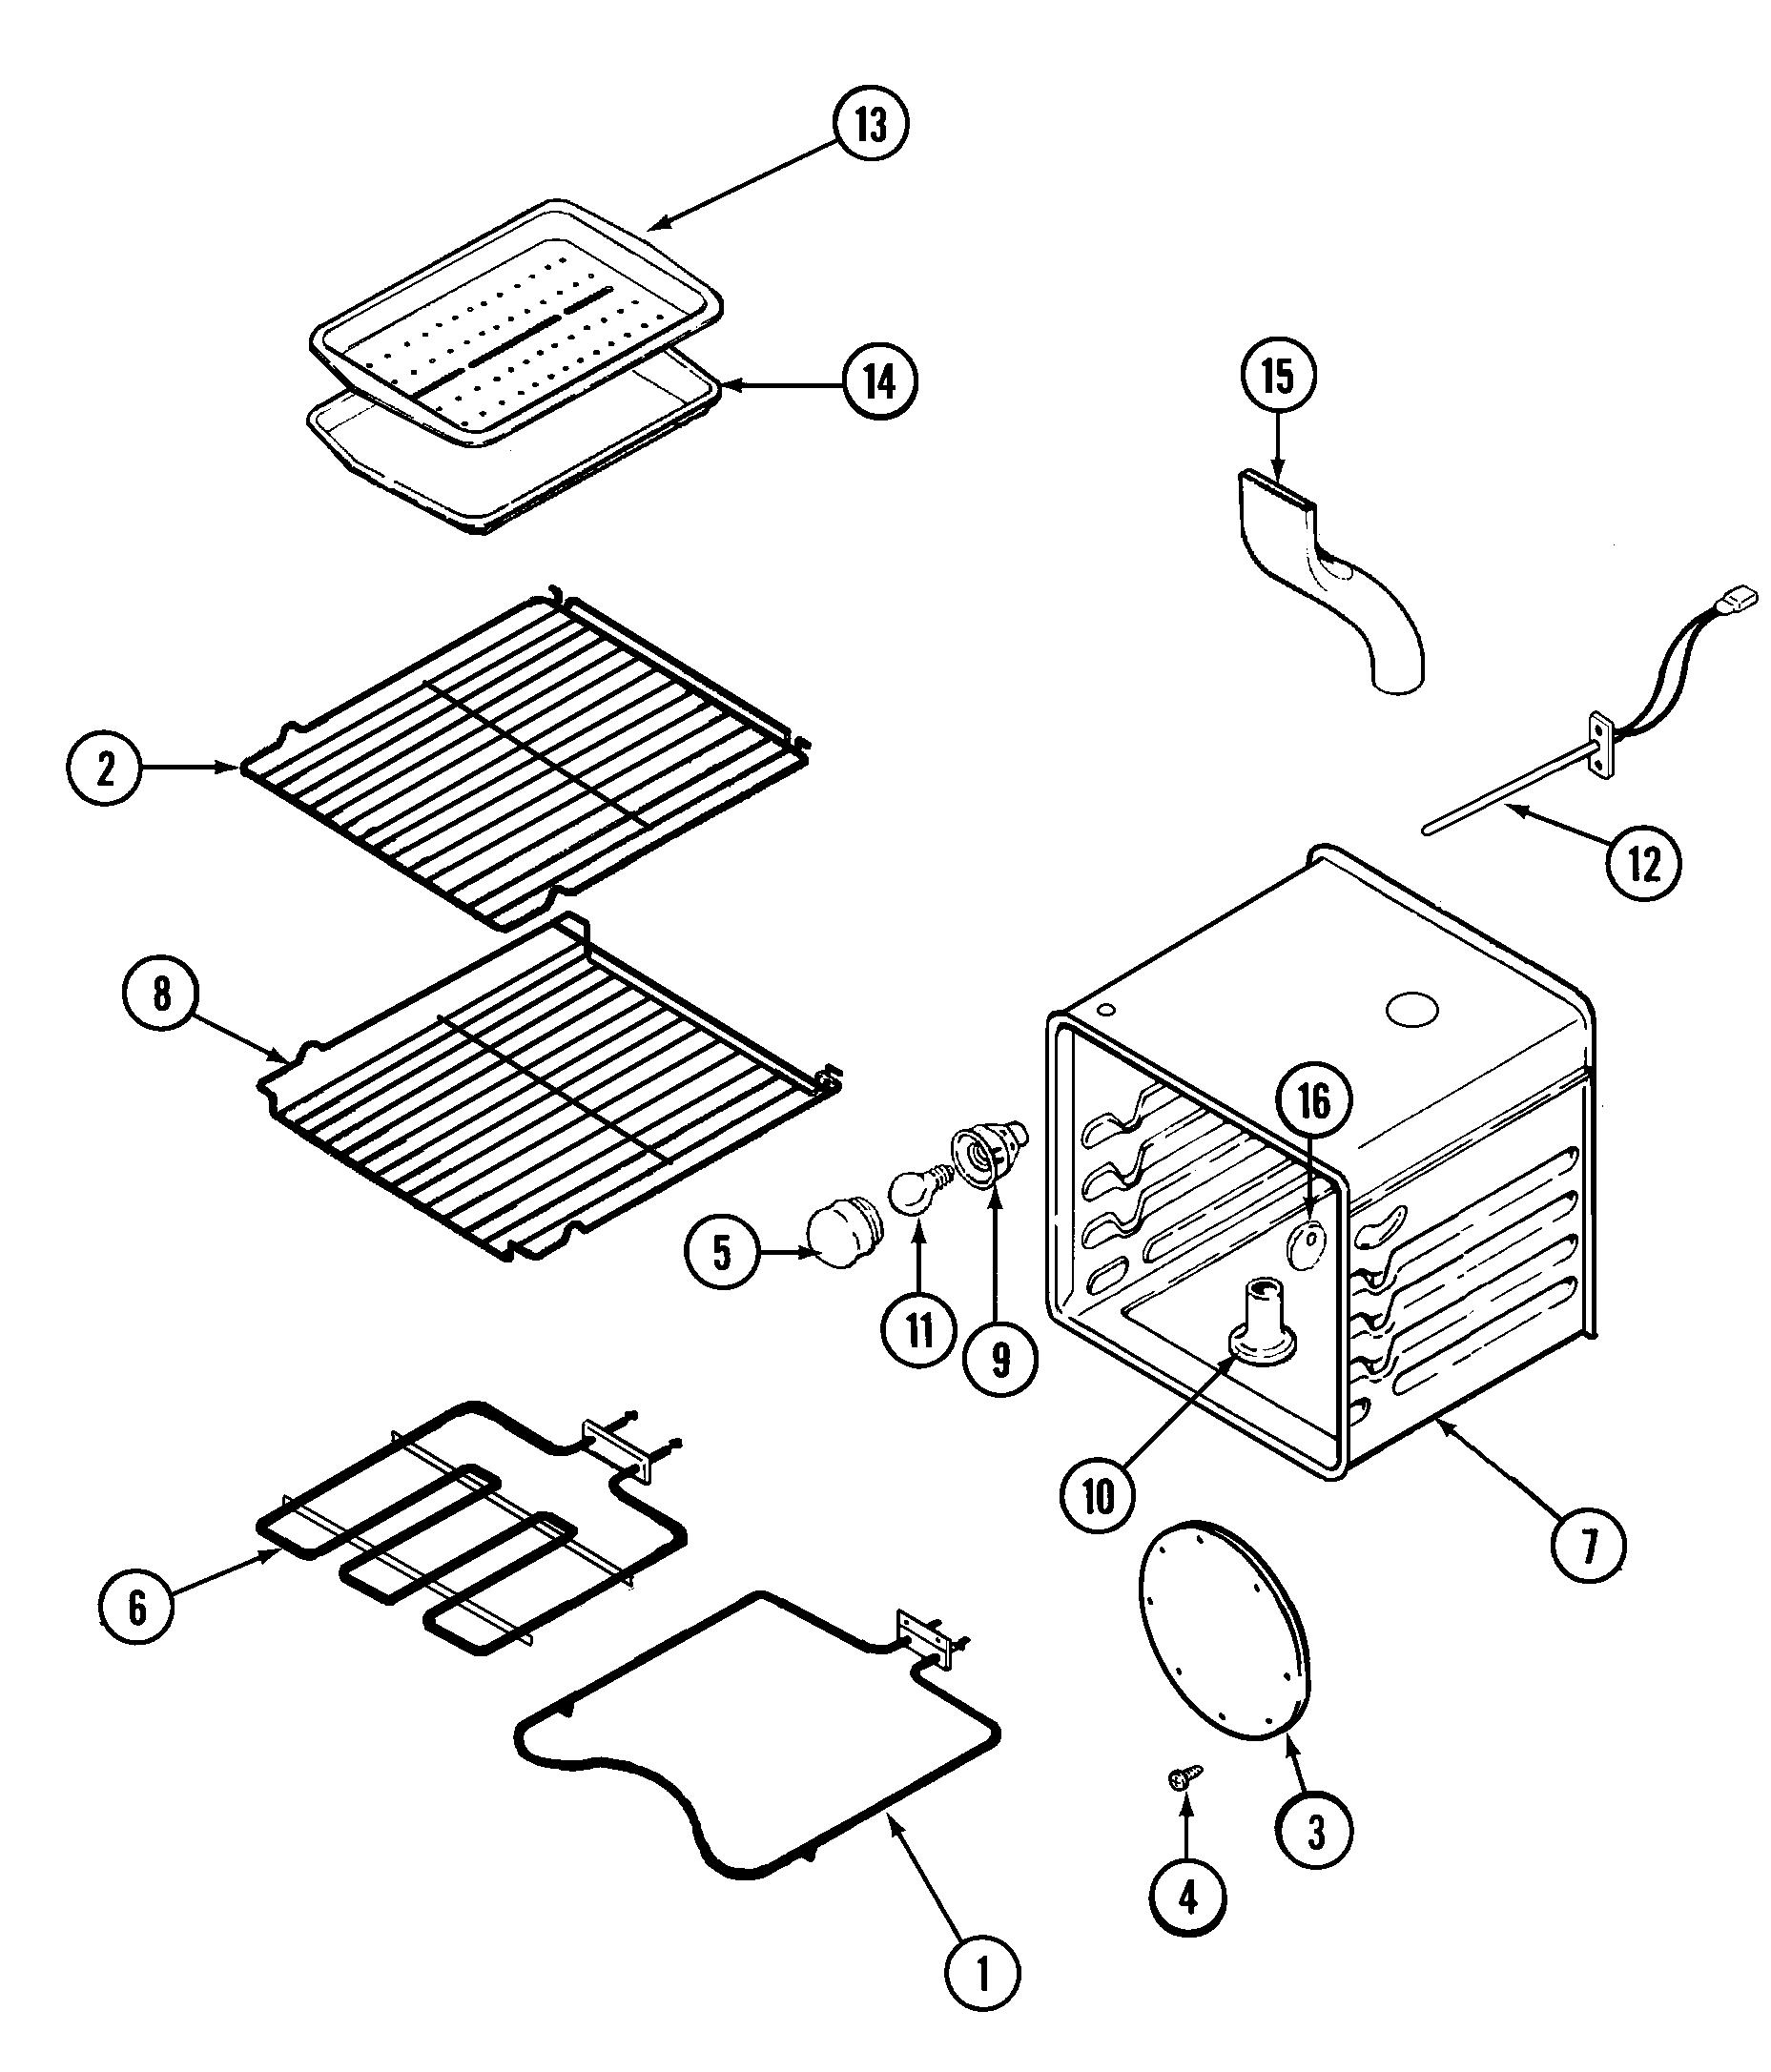 Sve47100 electric slide in range oven parts diagram